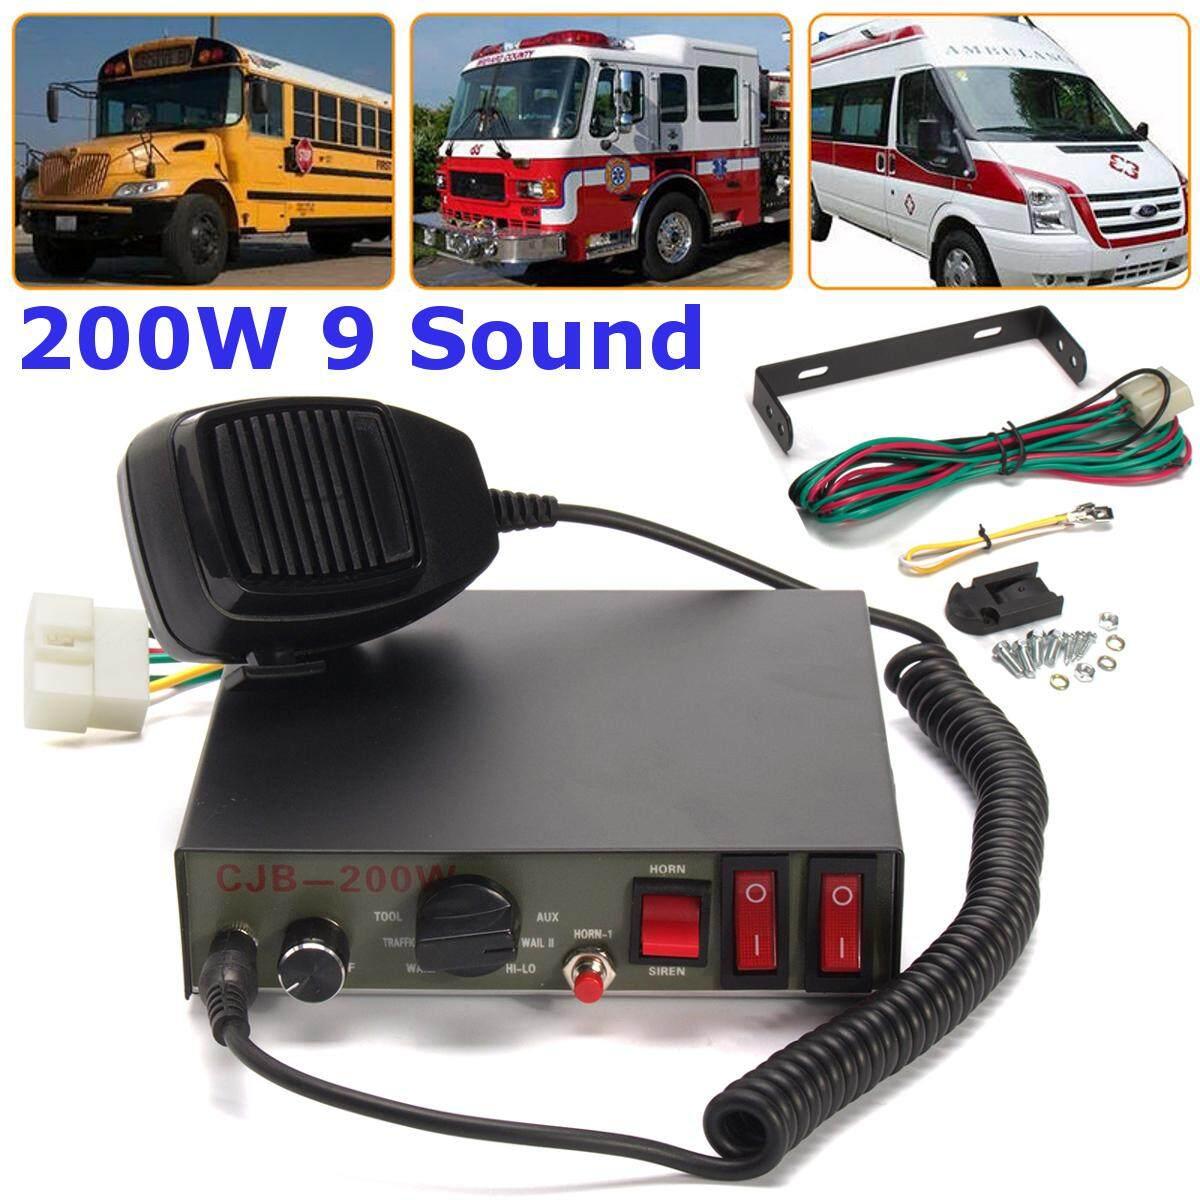 200 W 9-Nada Suara Keras Mobil Peringatan Truk Alarm Polisi Speaker Sirene Klakson MIC Sistem